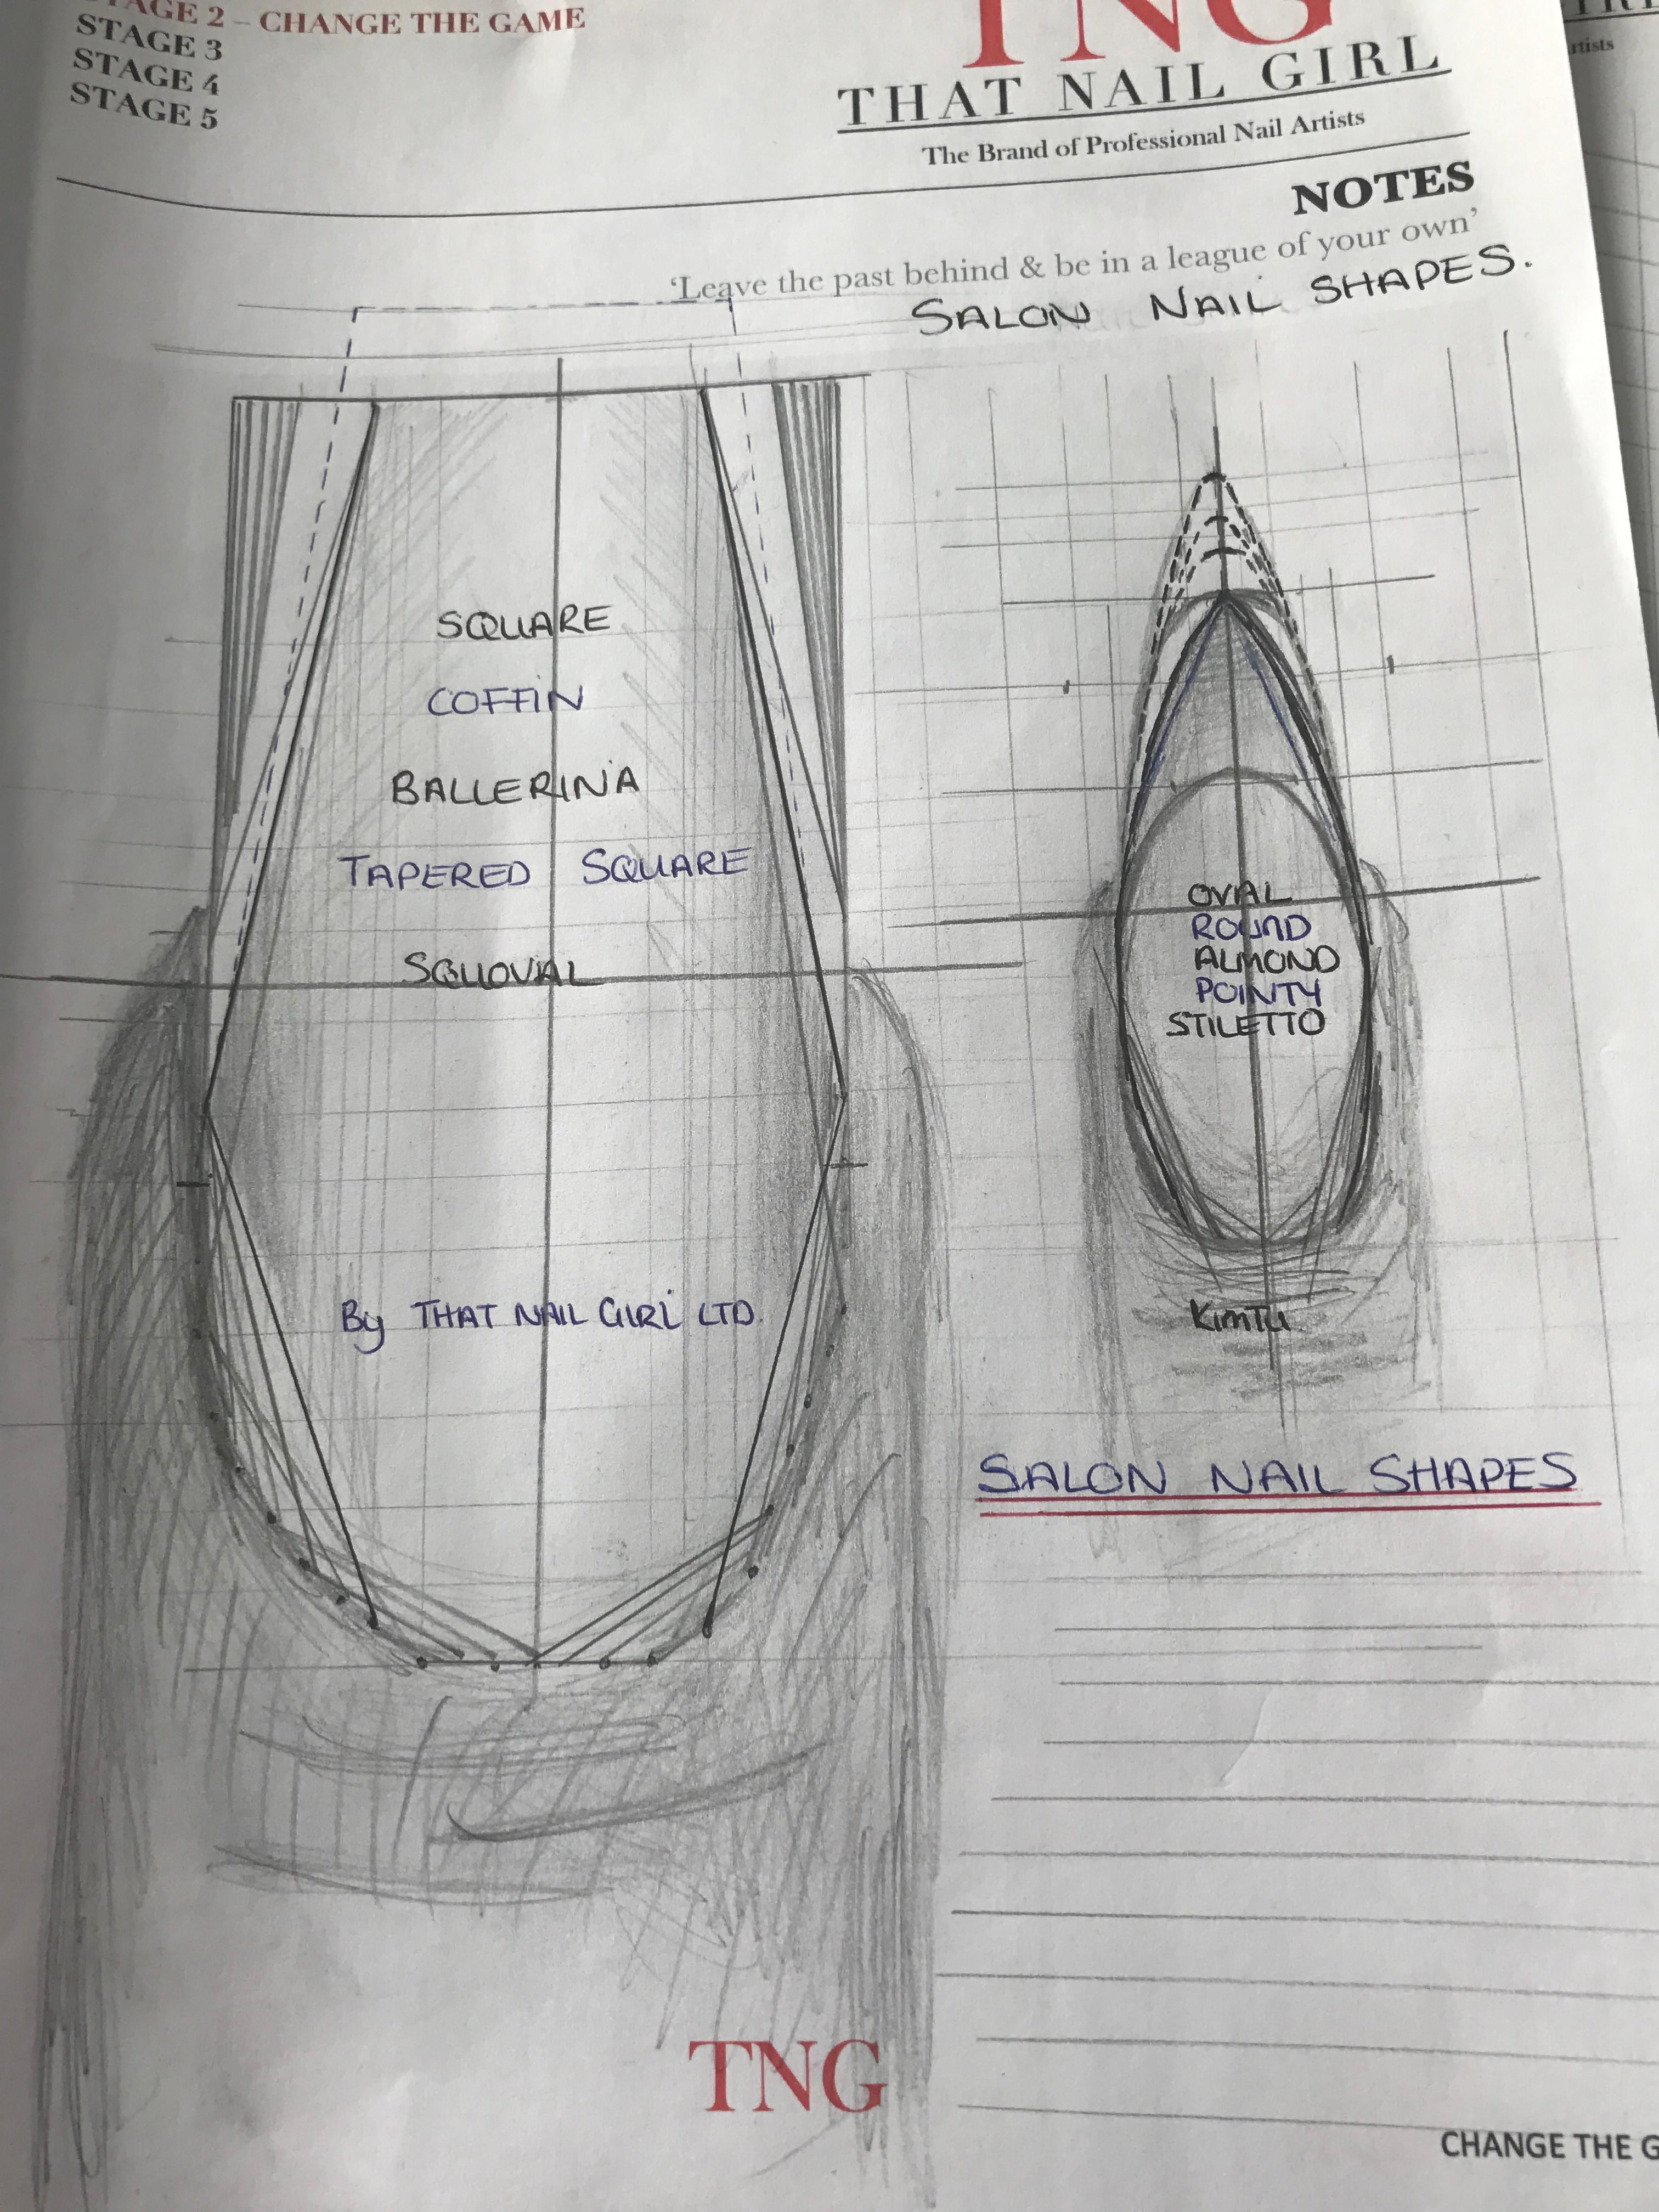 Intro - Sculpting Salon Nail Shapes (s1)